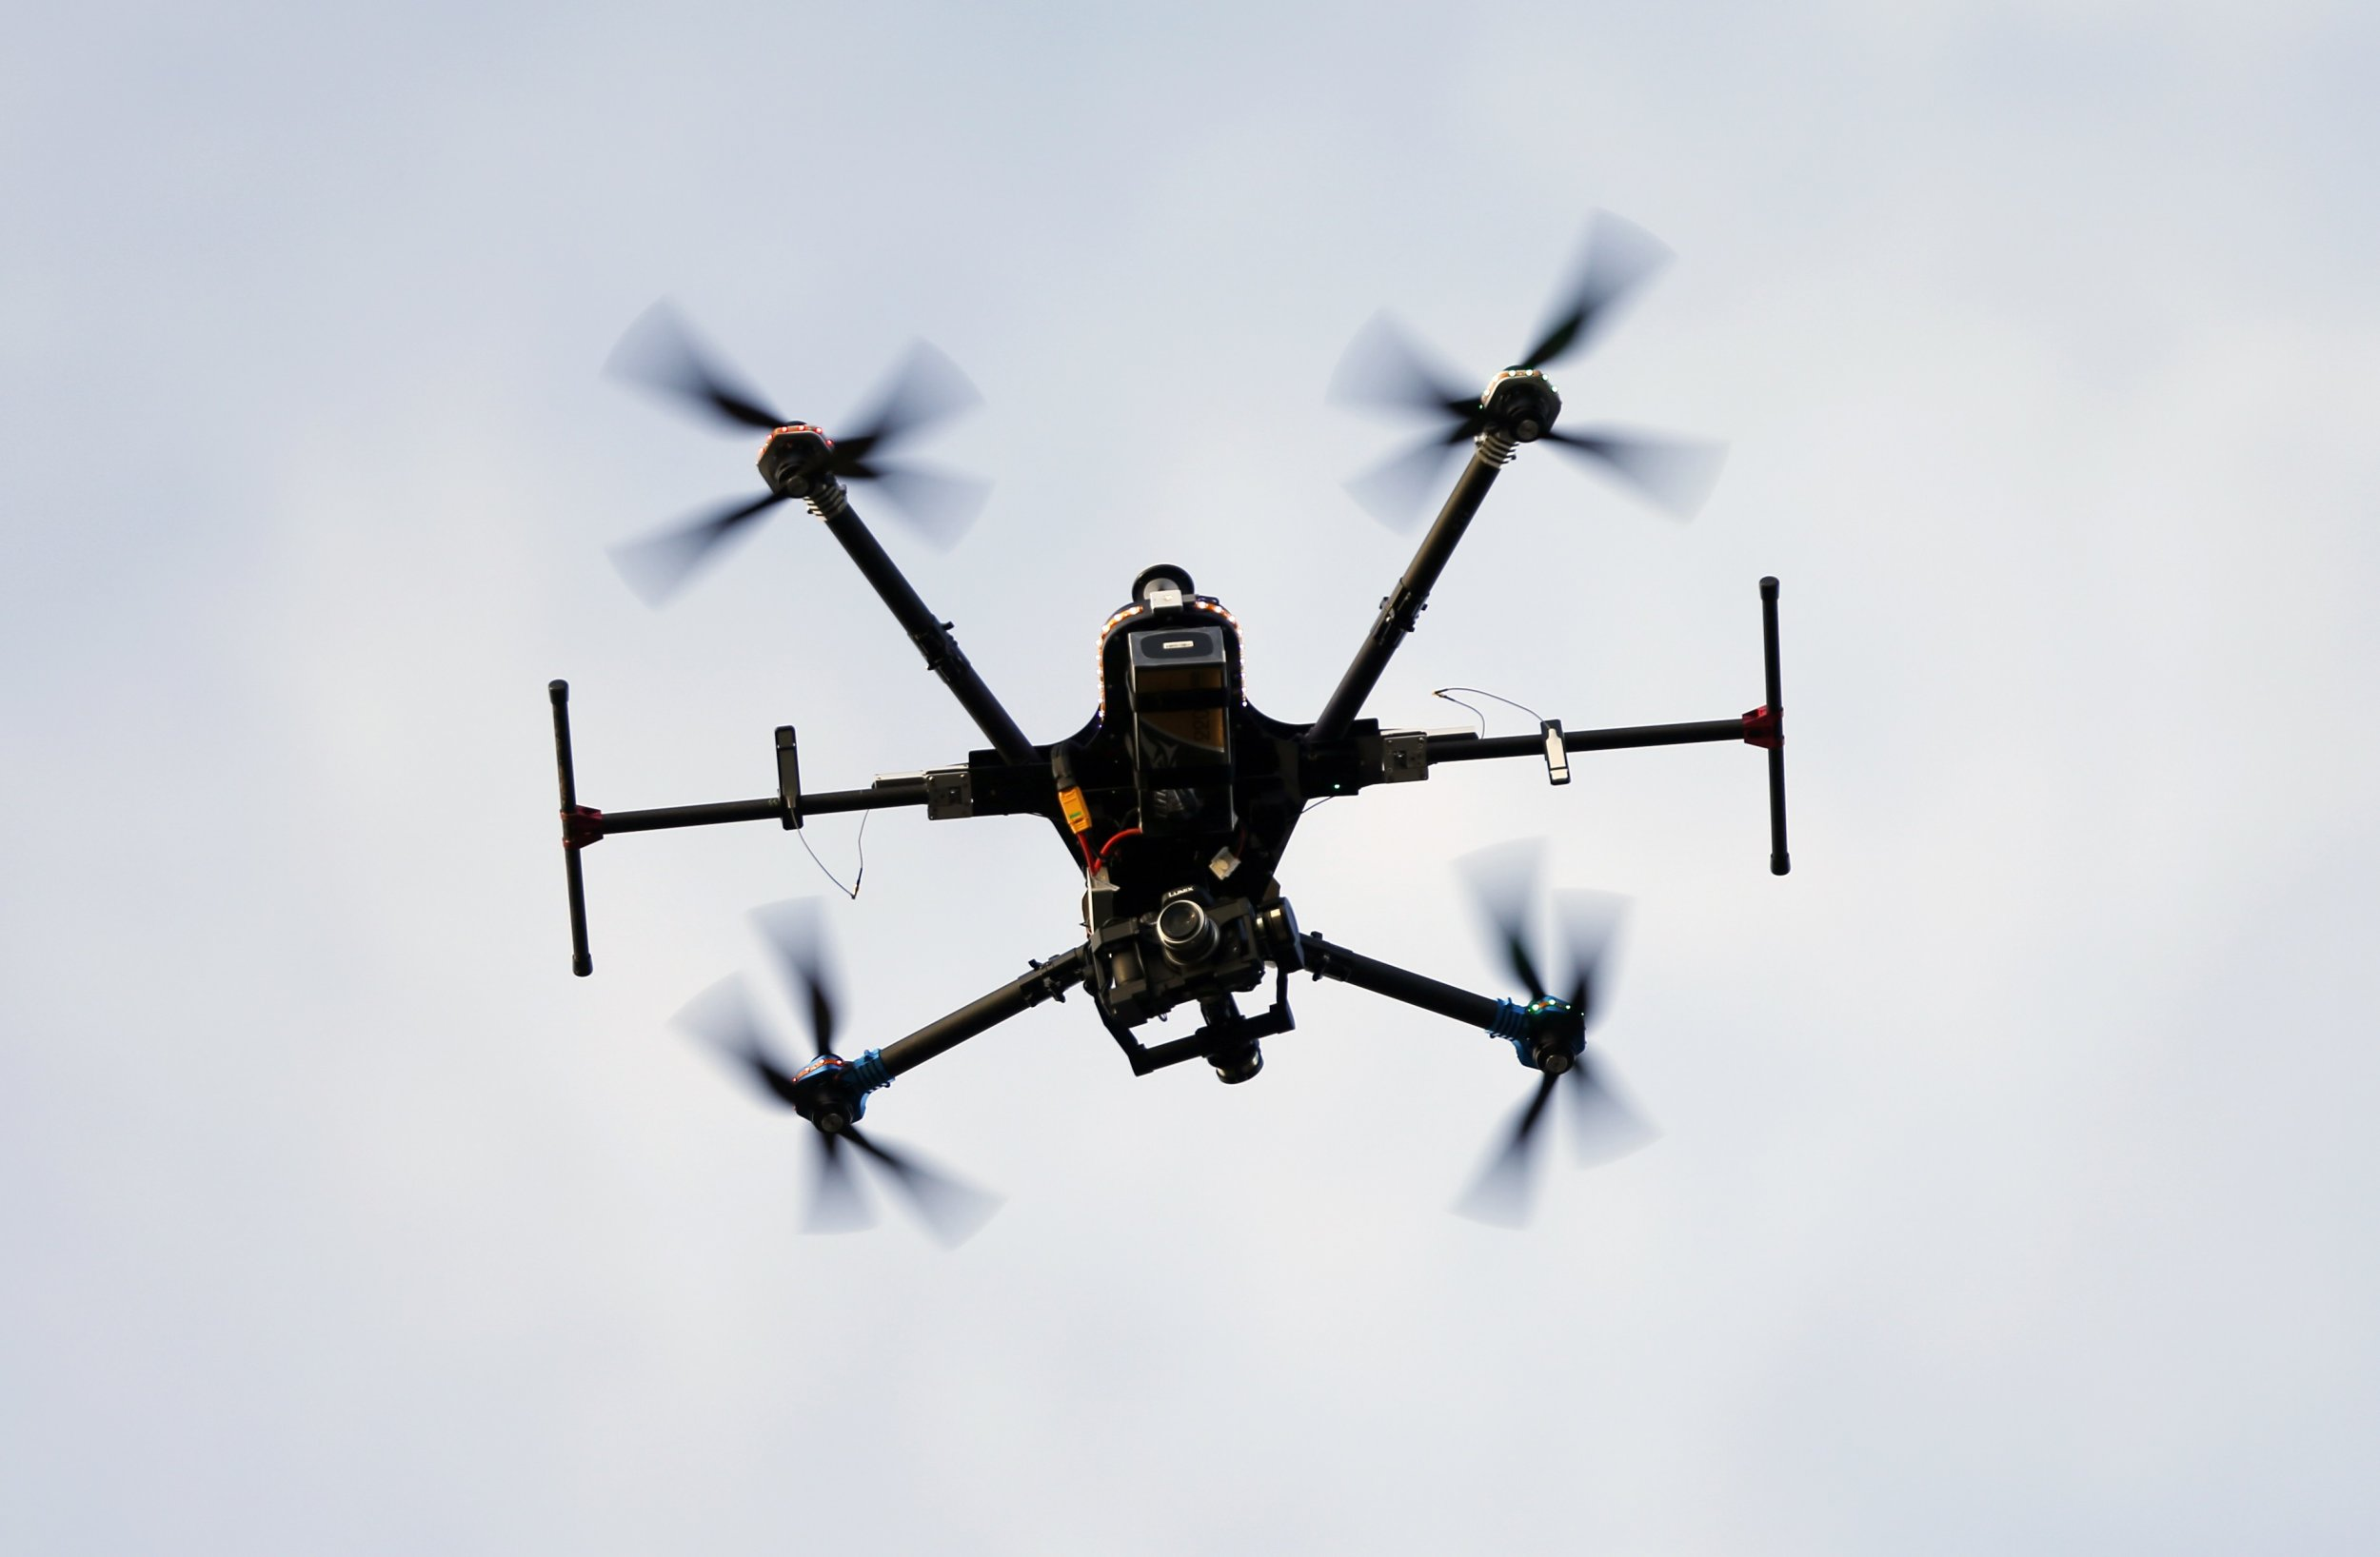 drone prison smuggler drugs contraband